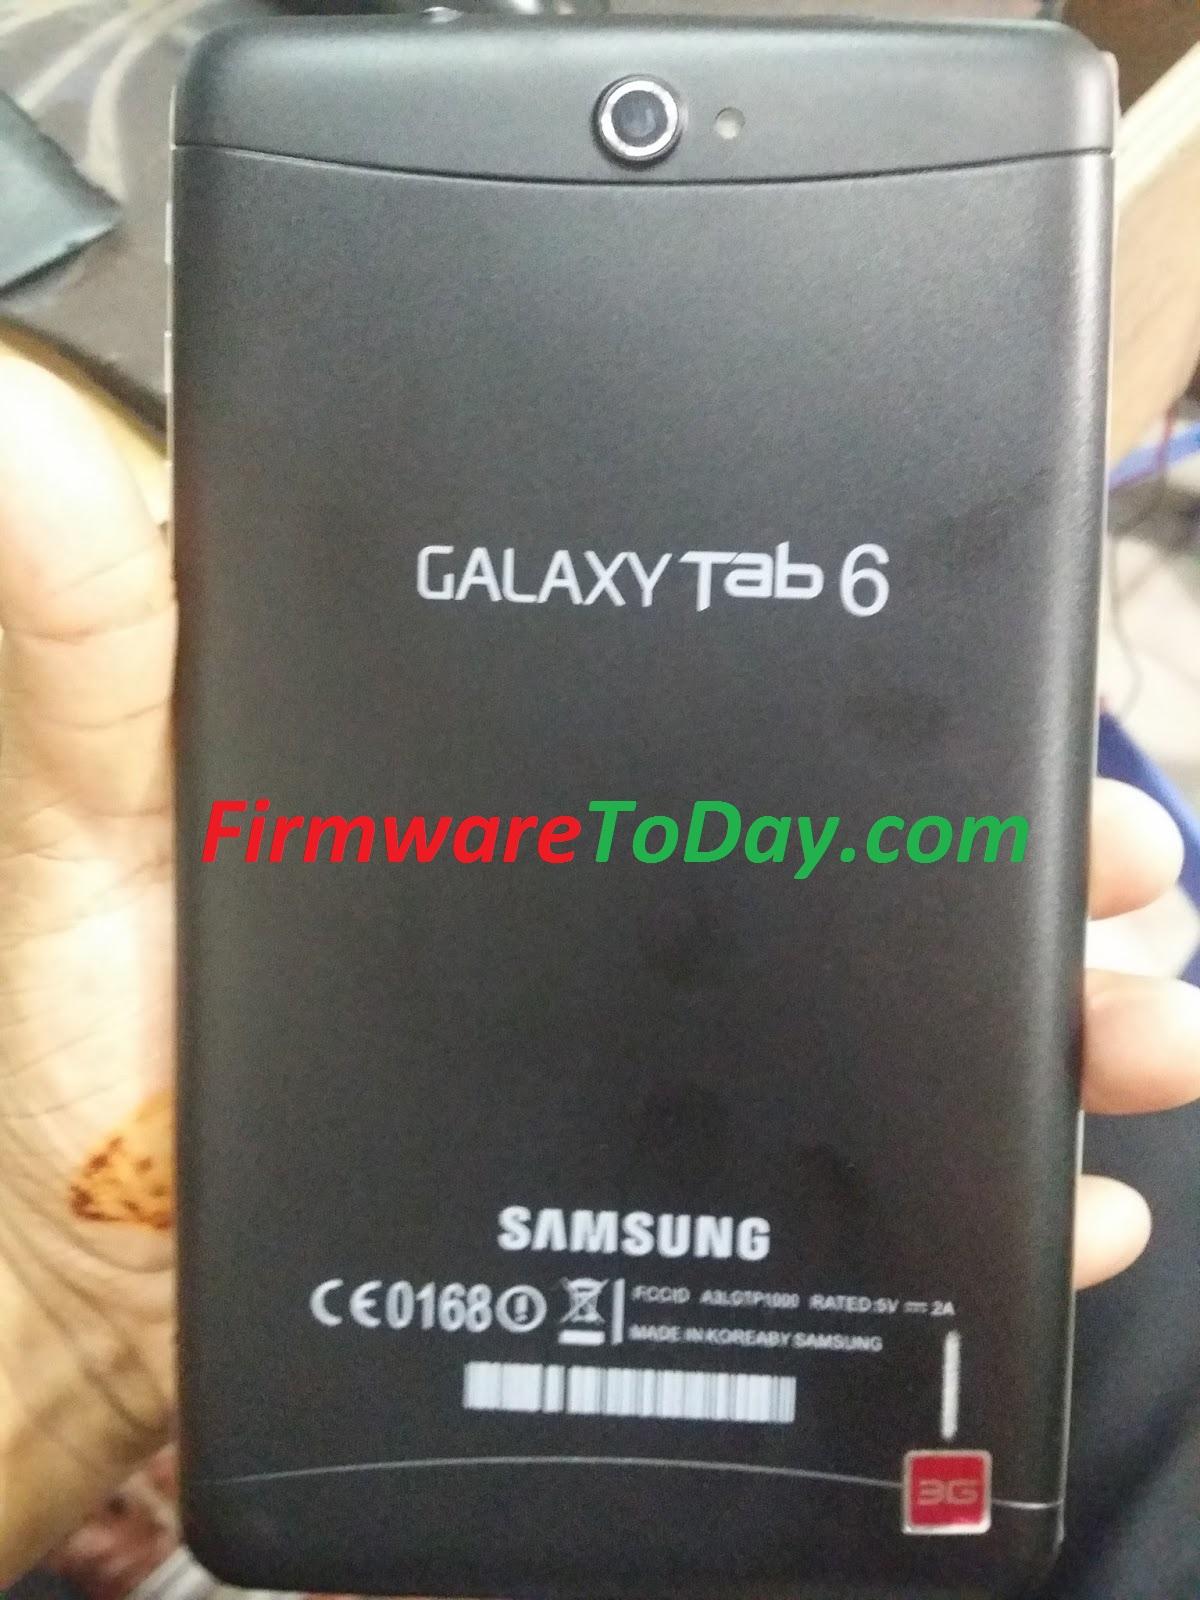 Samsung Galaxy Tab 6 Flash file Free New MT6577 4.1.2 2000% Tested By FirmwareToday.com